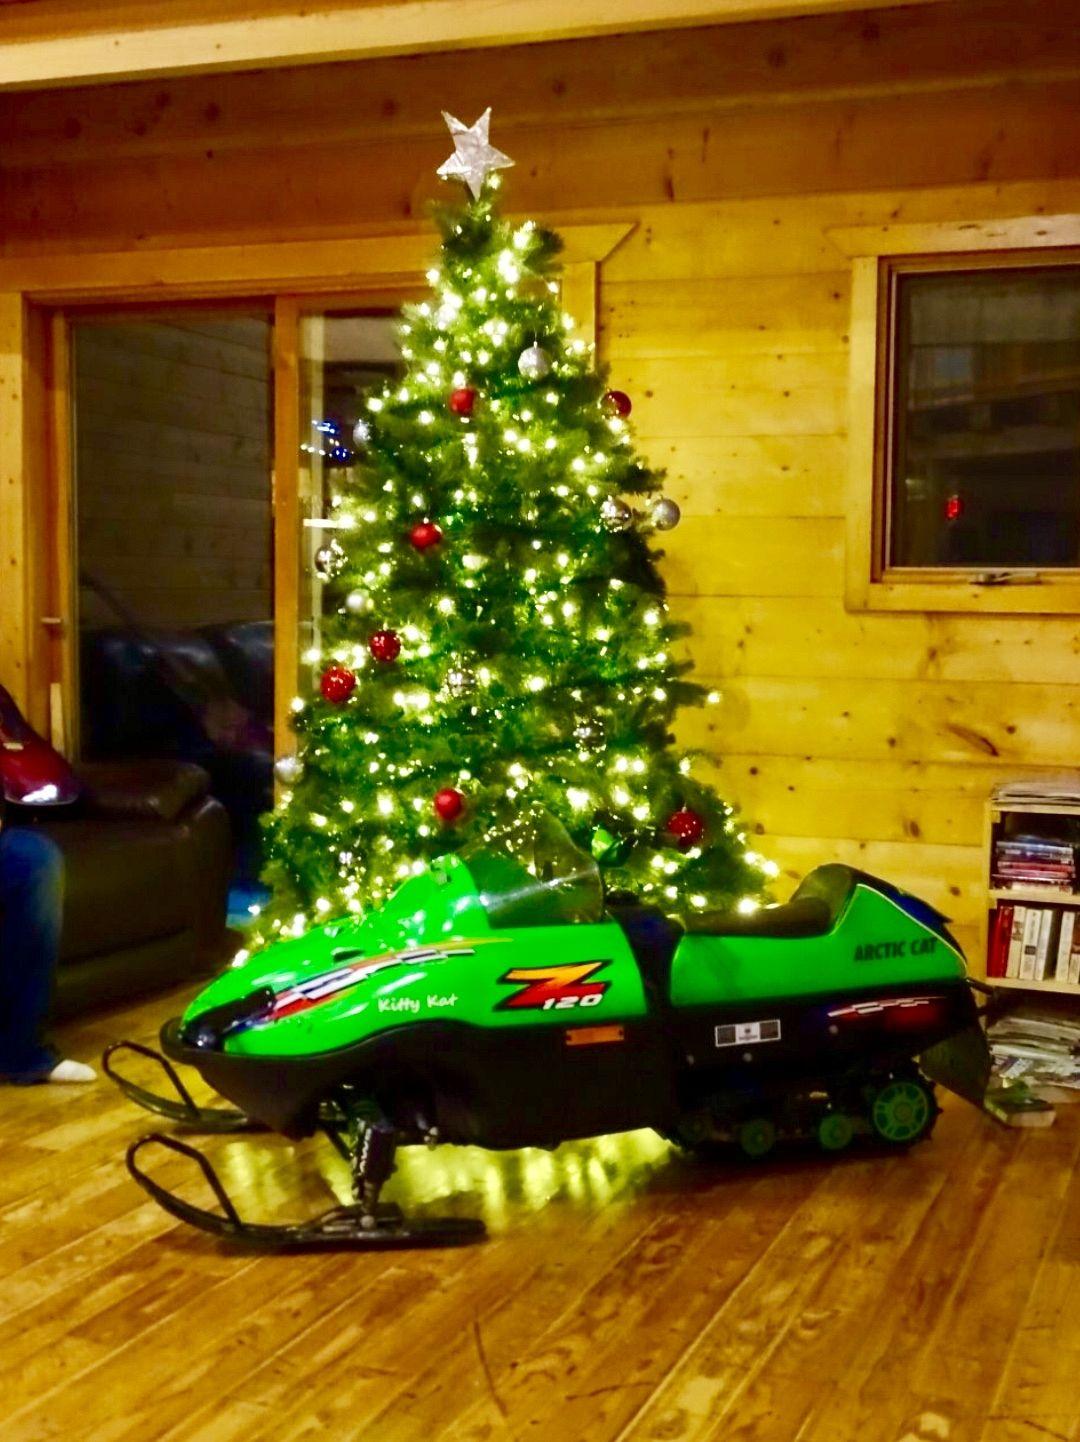 A sledder Christmas. A boy's first sled